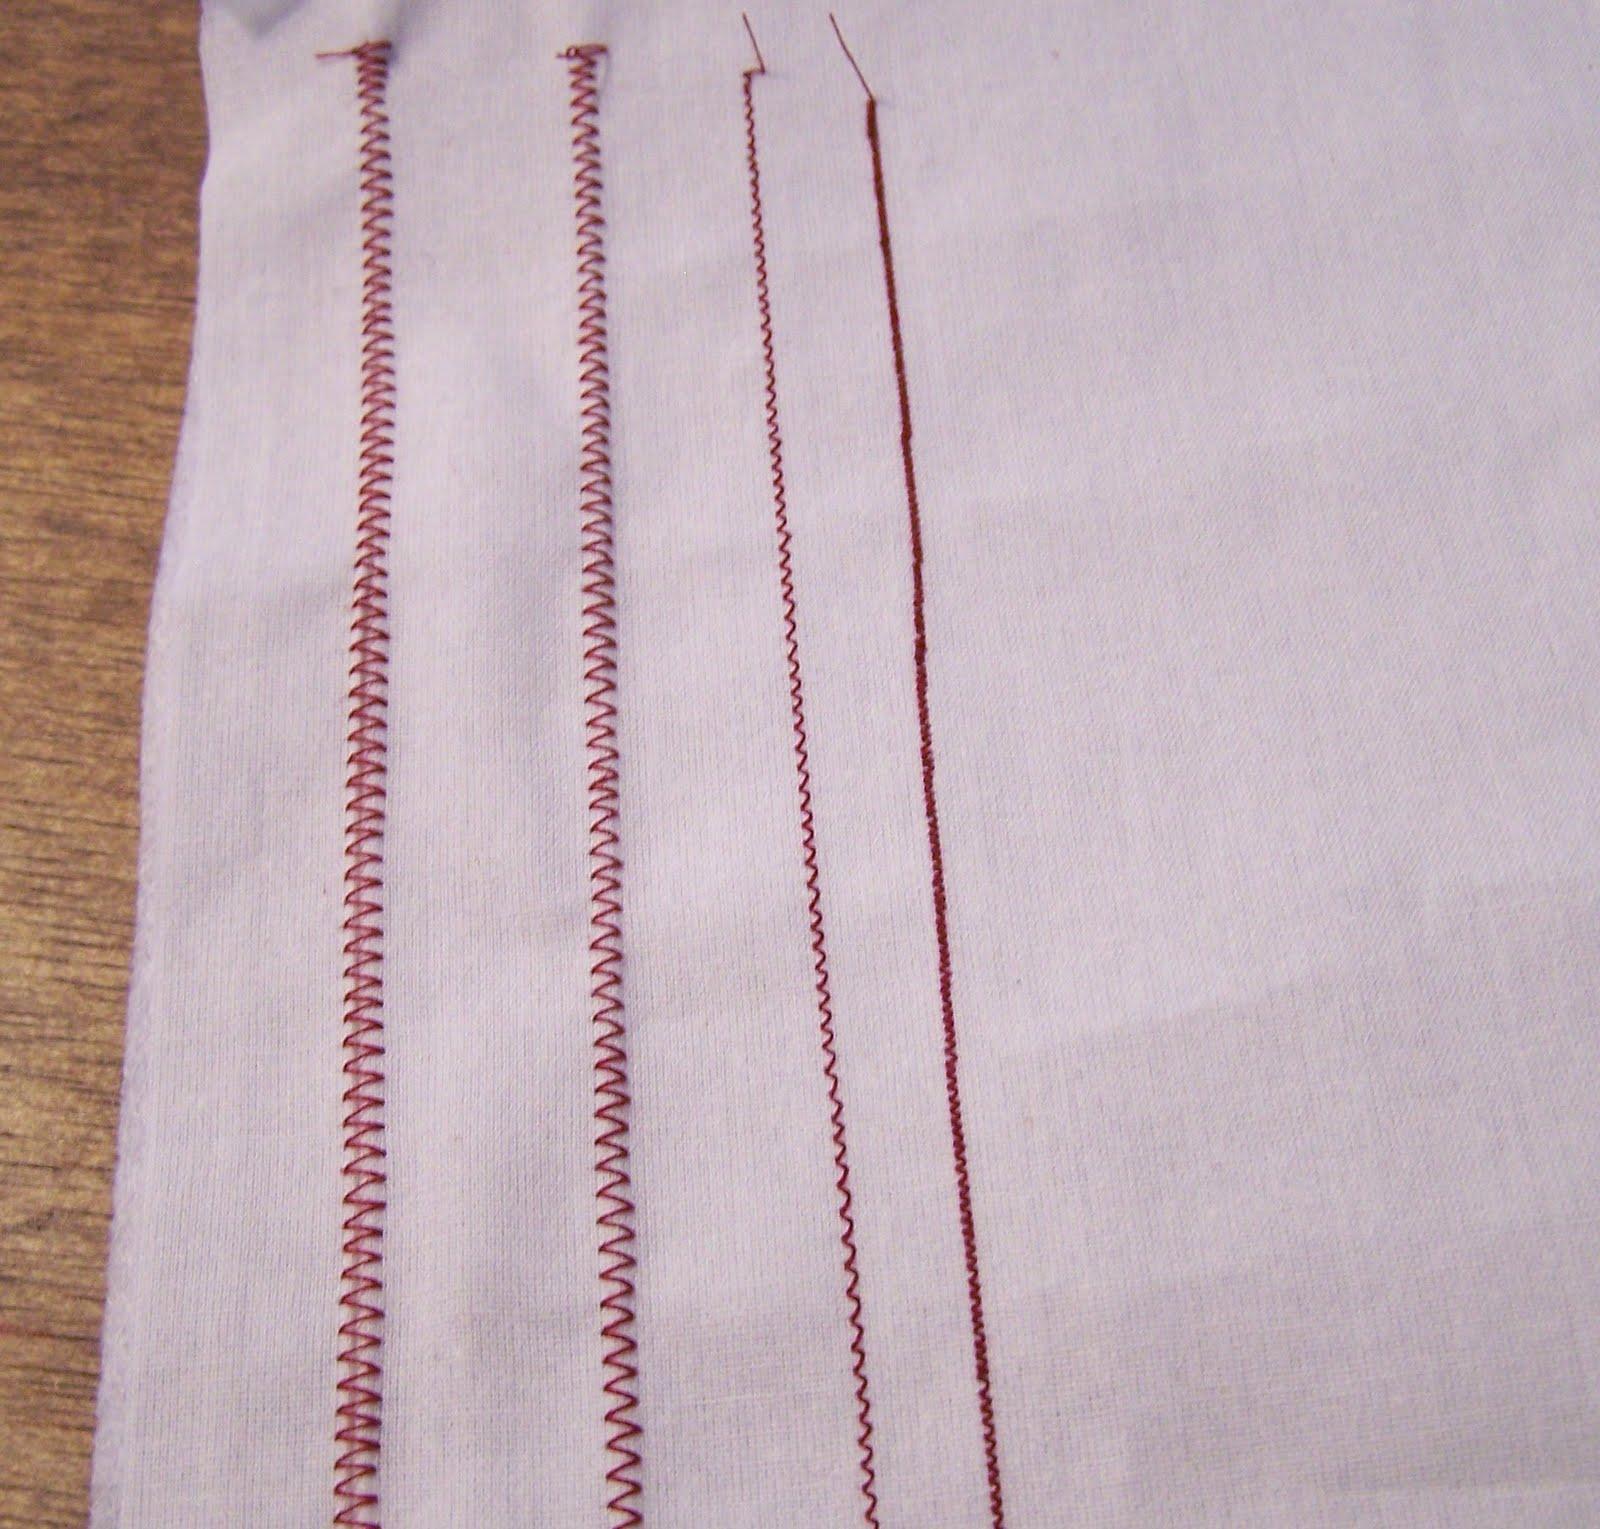 zigzag stitch sewing machine